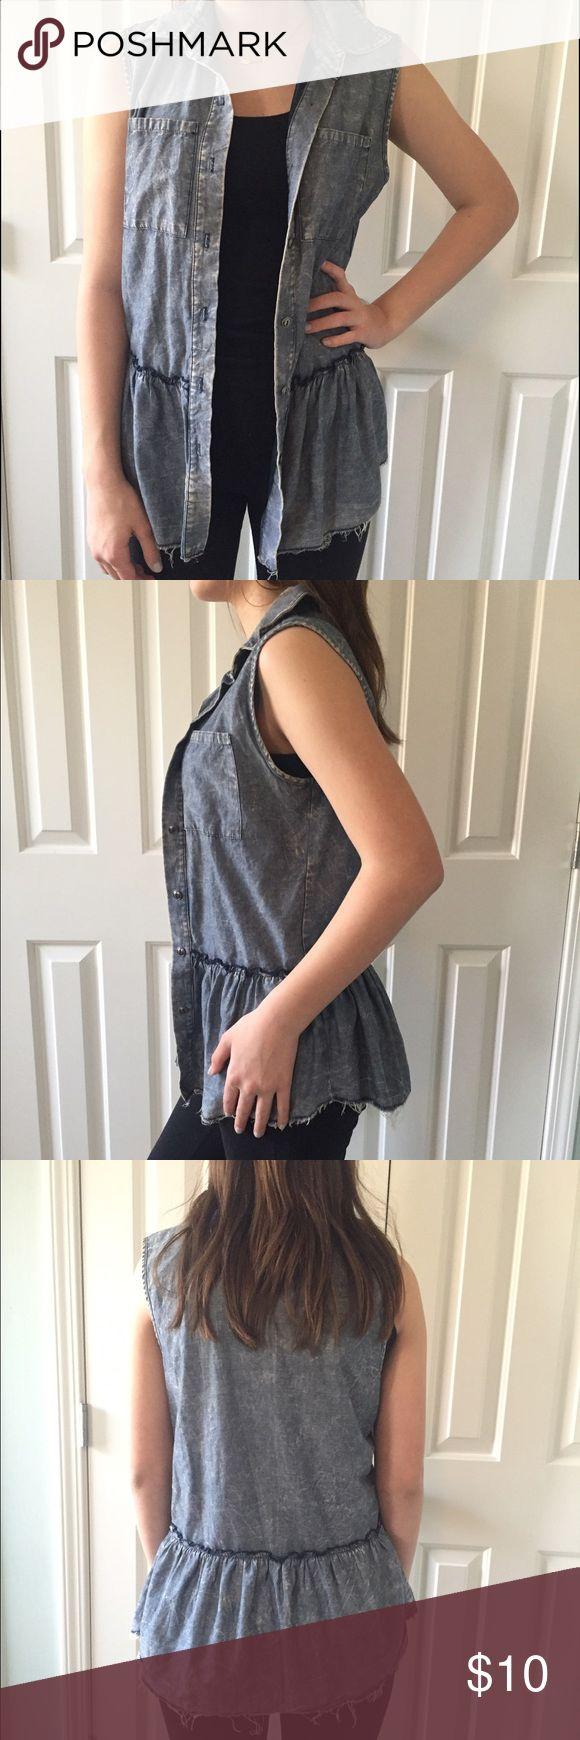 Socialite sleeveless ruffle denim shirt Size XS sleeveless denim button up shirt with flirty ruffle bottom.  From Nordstrom worn once.  100% cotton.  Very soft. socialite Tops Button Down Shirts